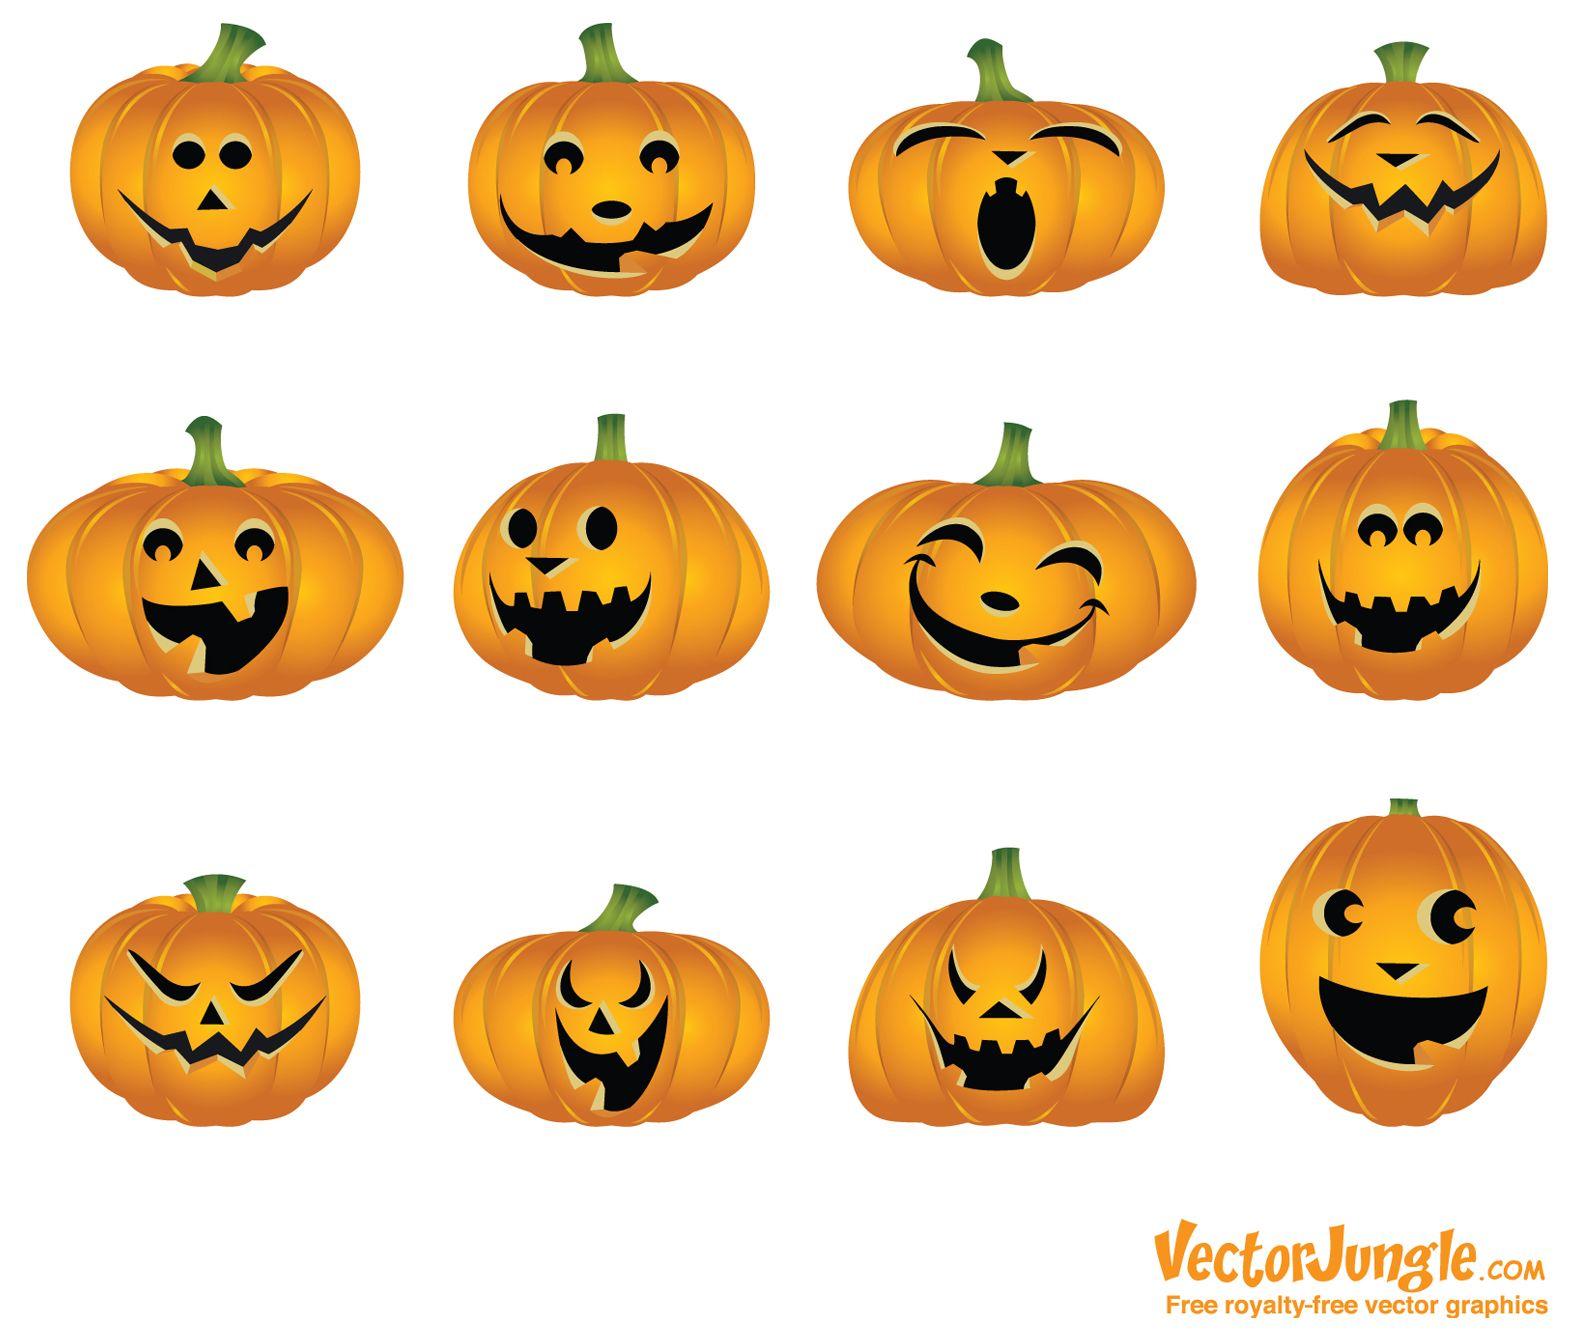 Free halloween jack o lantern patterns - 17 Best Images About Pumpkin Faces On Pinterest Stencils Halloween Games For Kids And Pumpkins